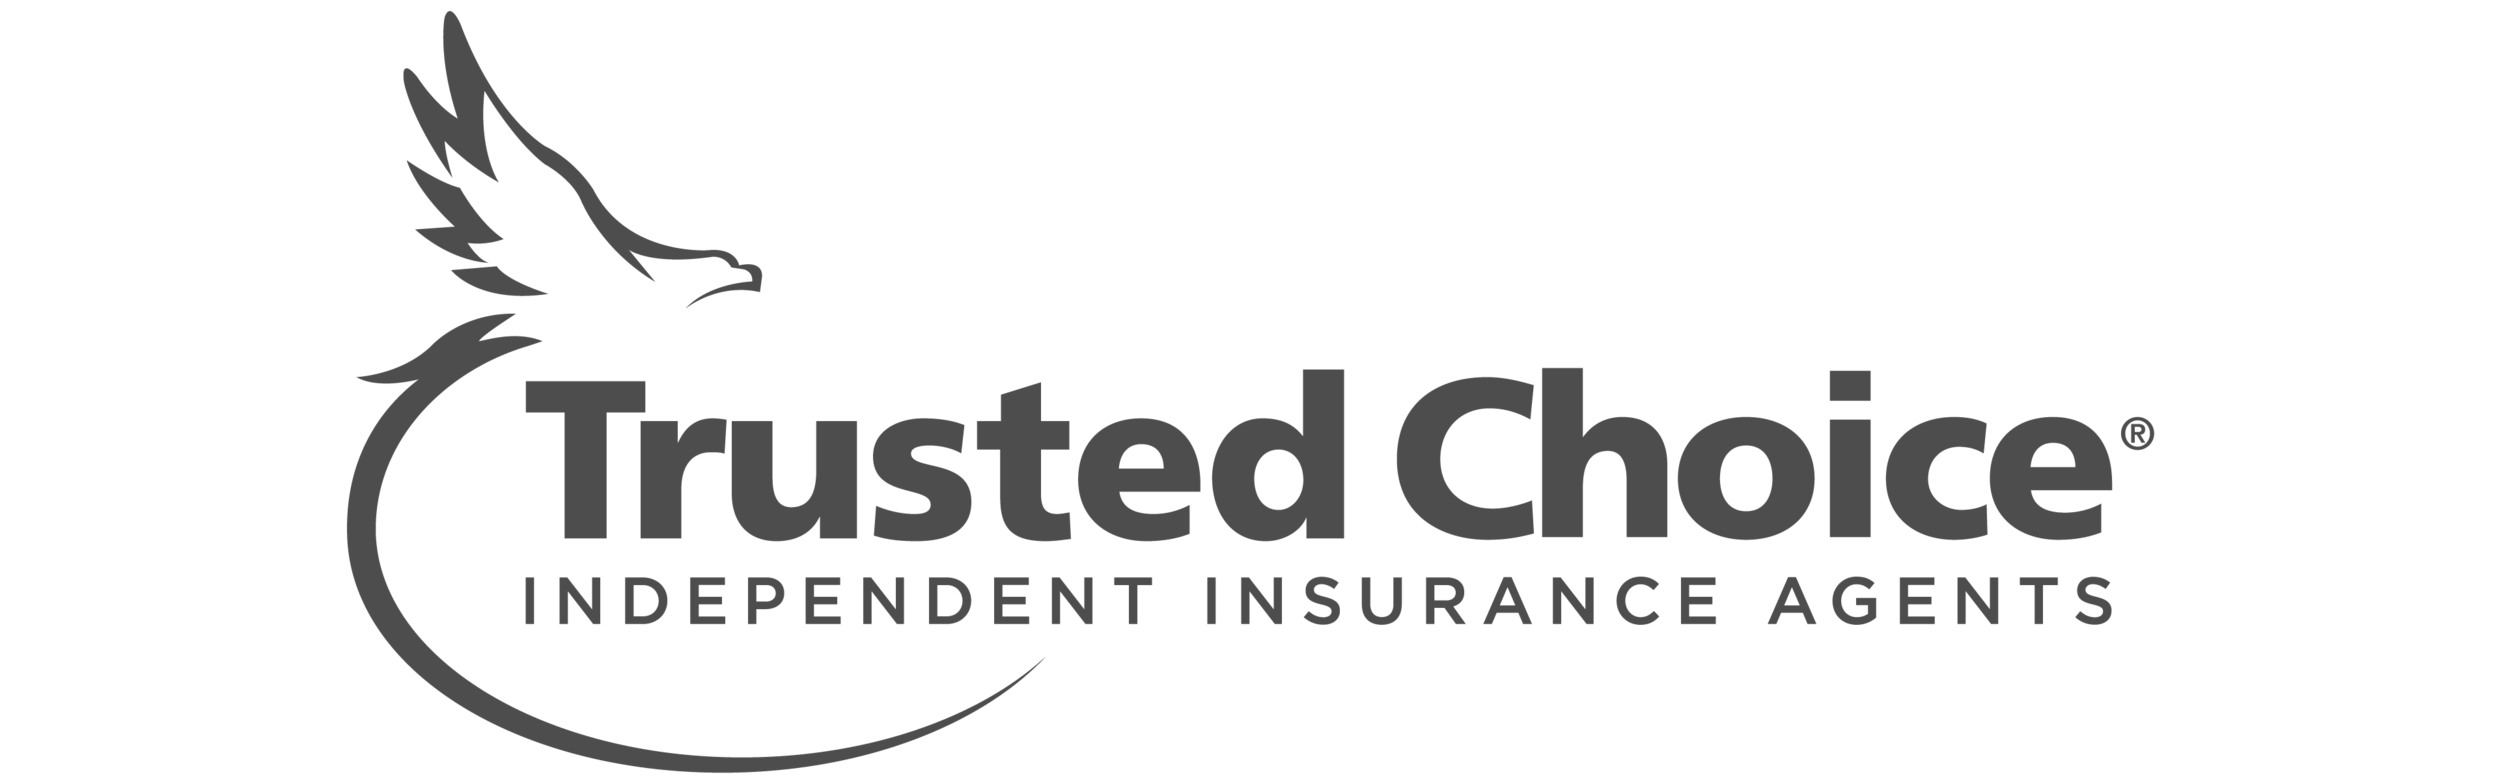 TC logo button